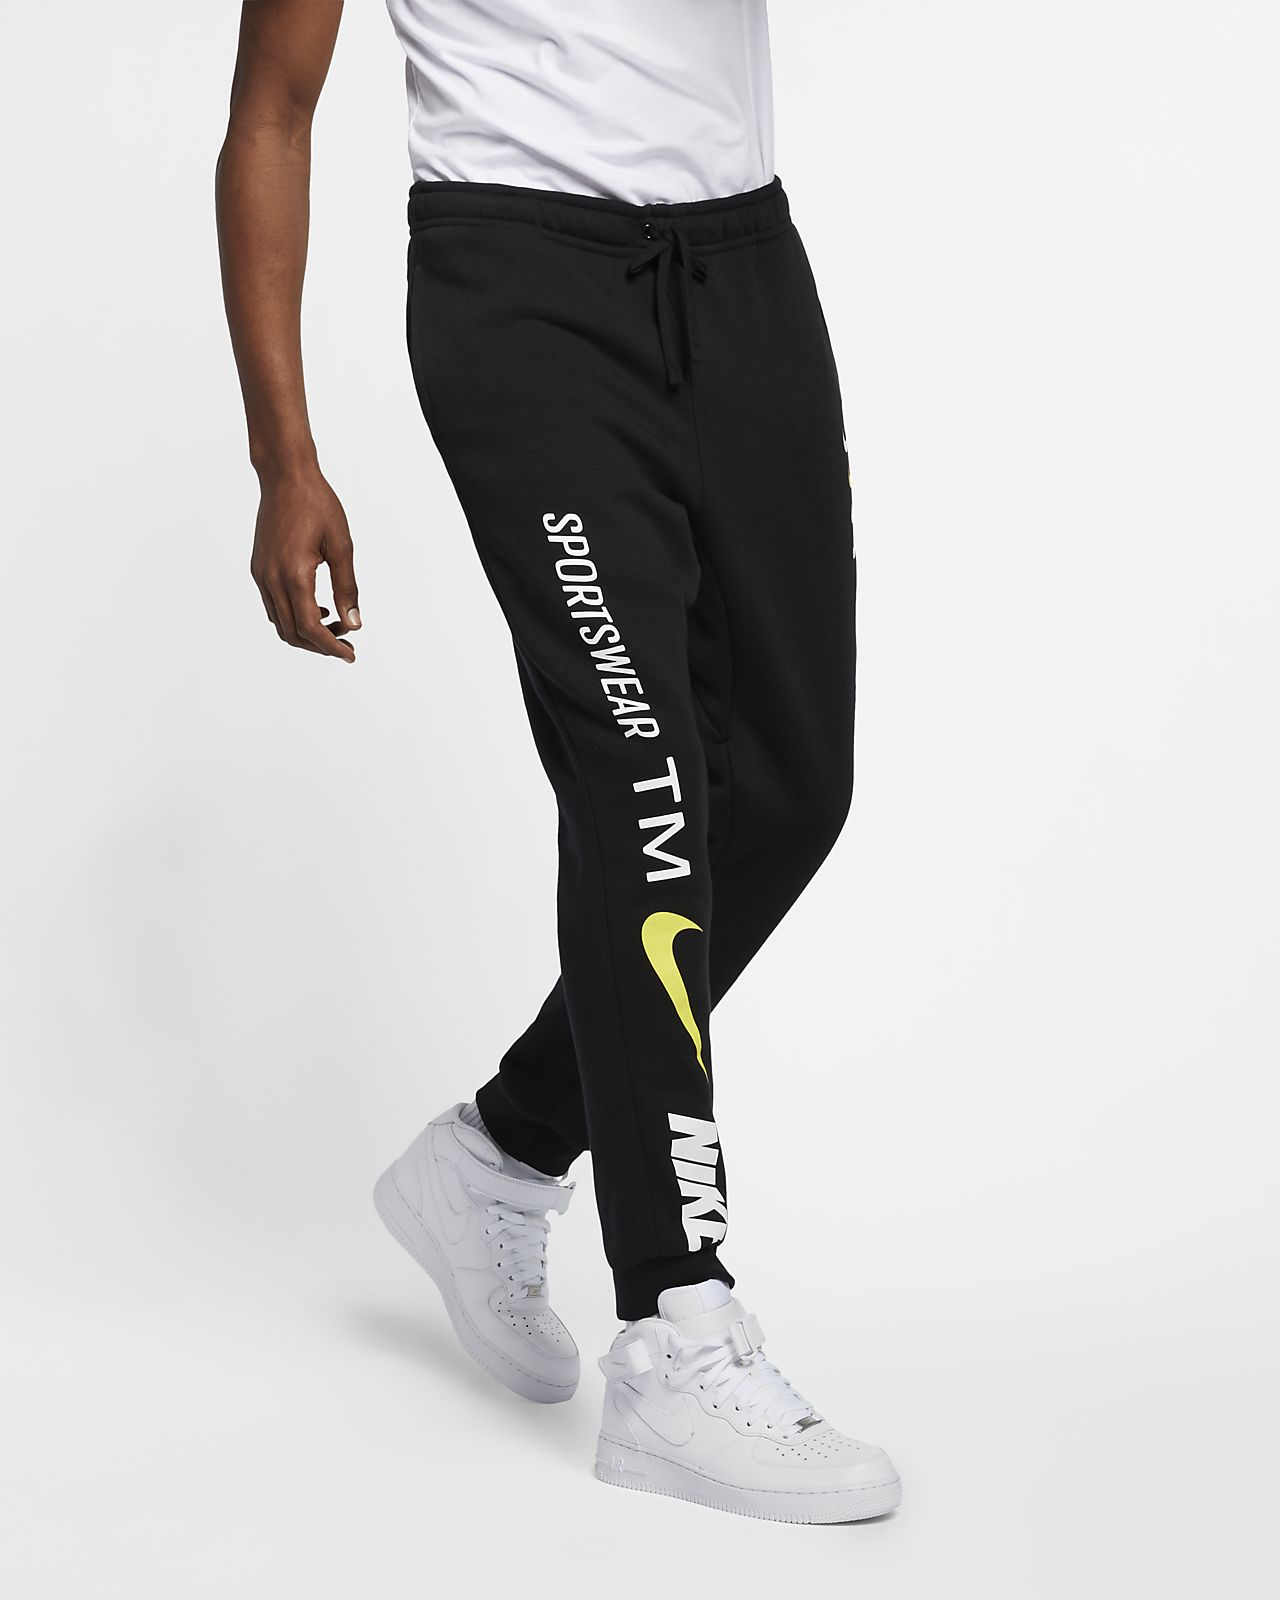 9568baa229 Pantalon de jogging Nike Sportswear Club. Nike.com FR